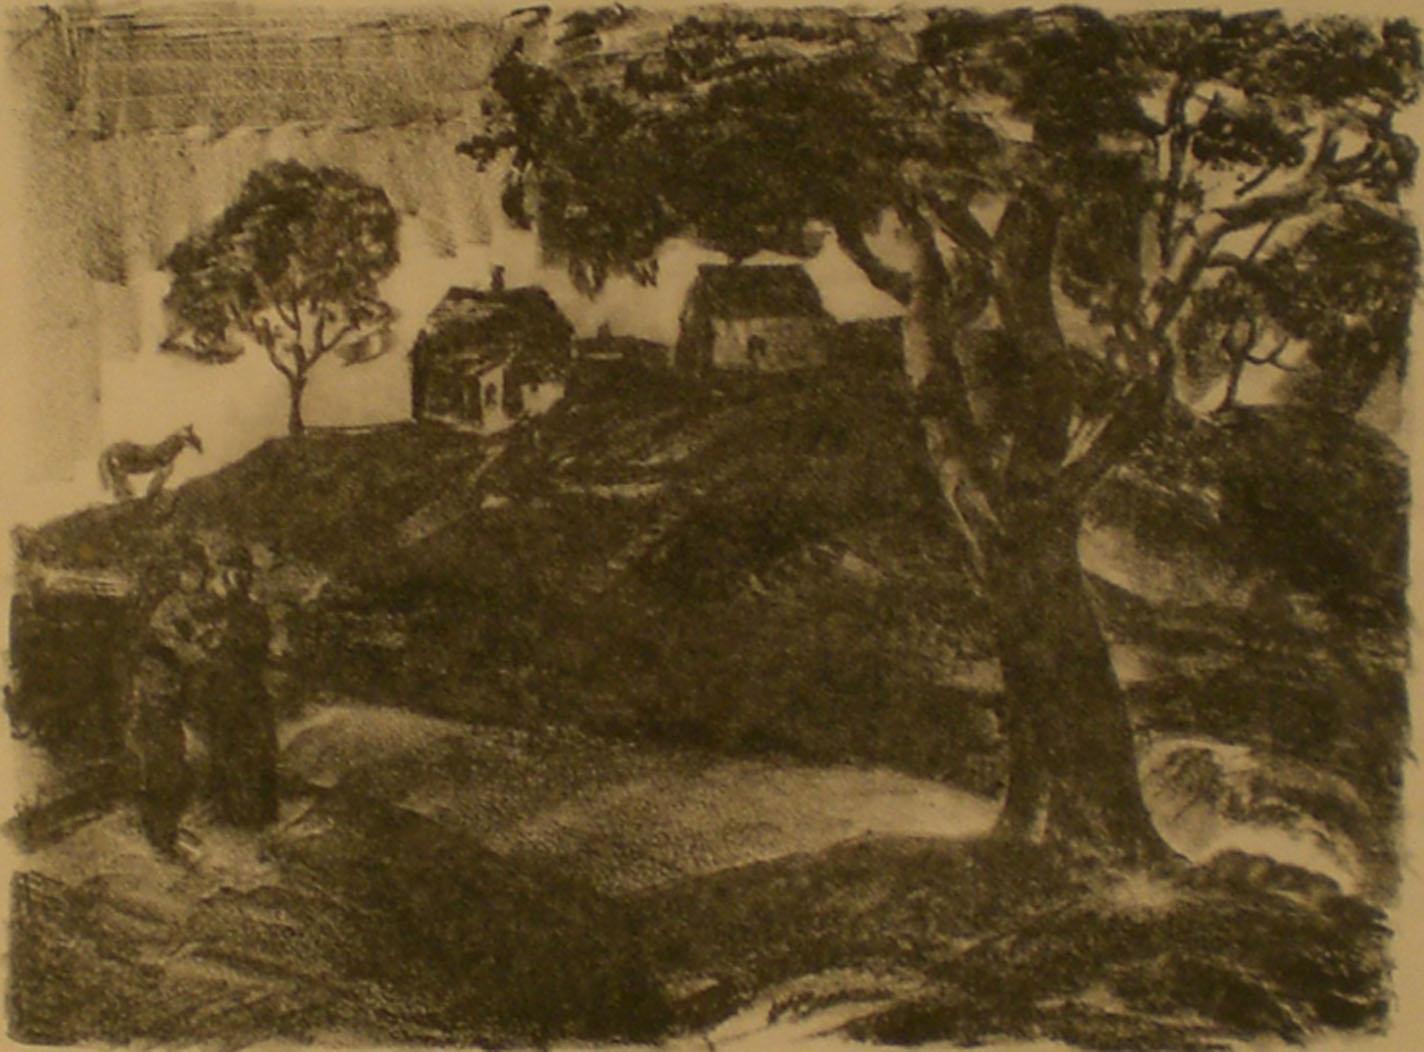 Hillside Homes , print, 17 ¾ x 15 ¾  Pathways Original Print Collection